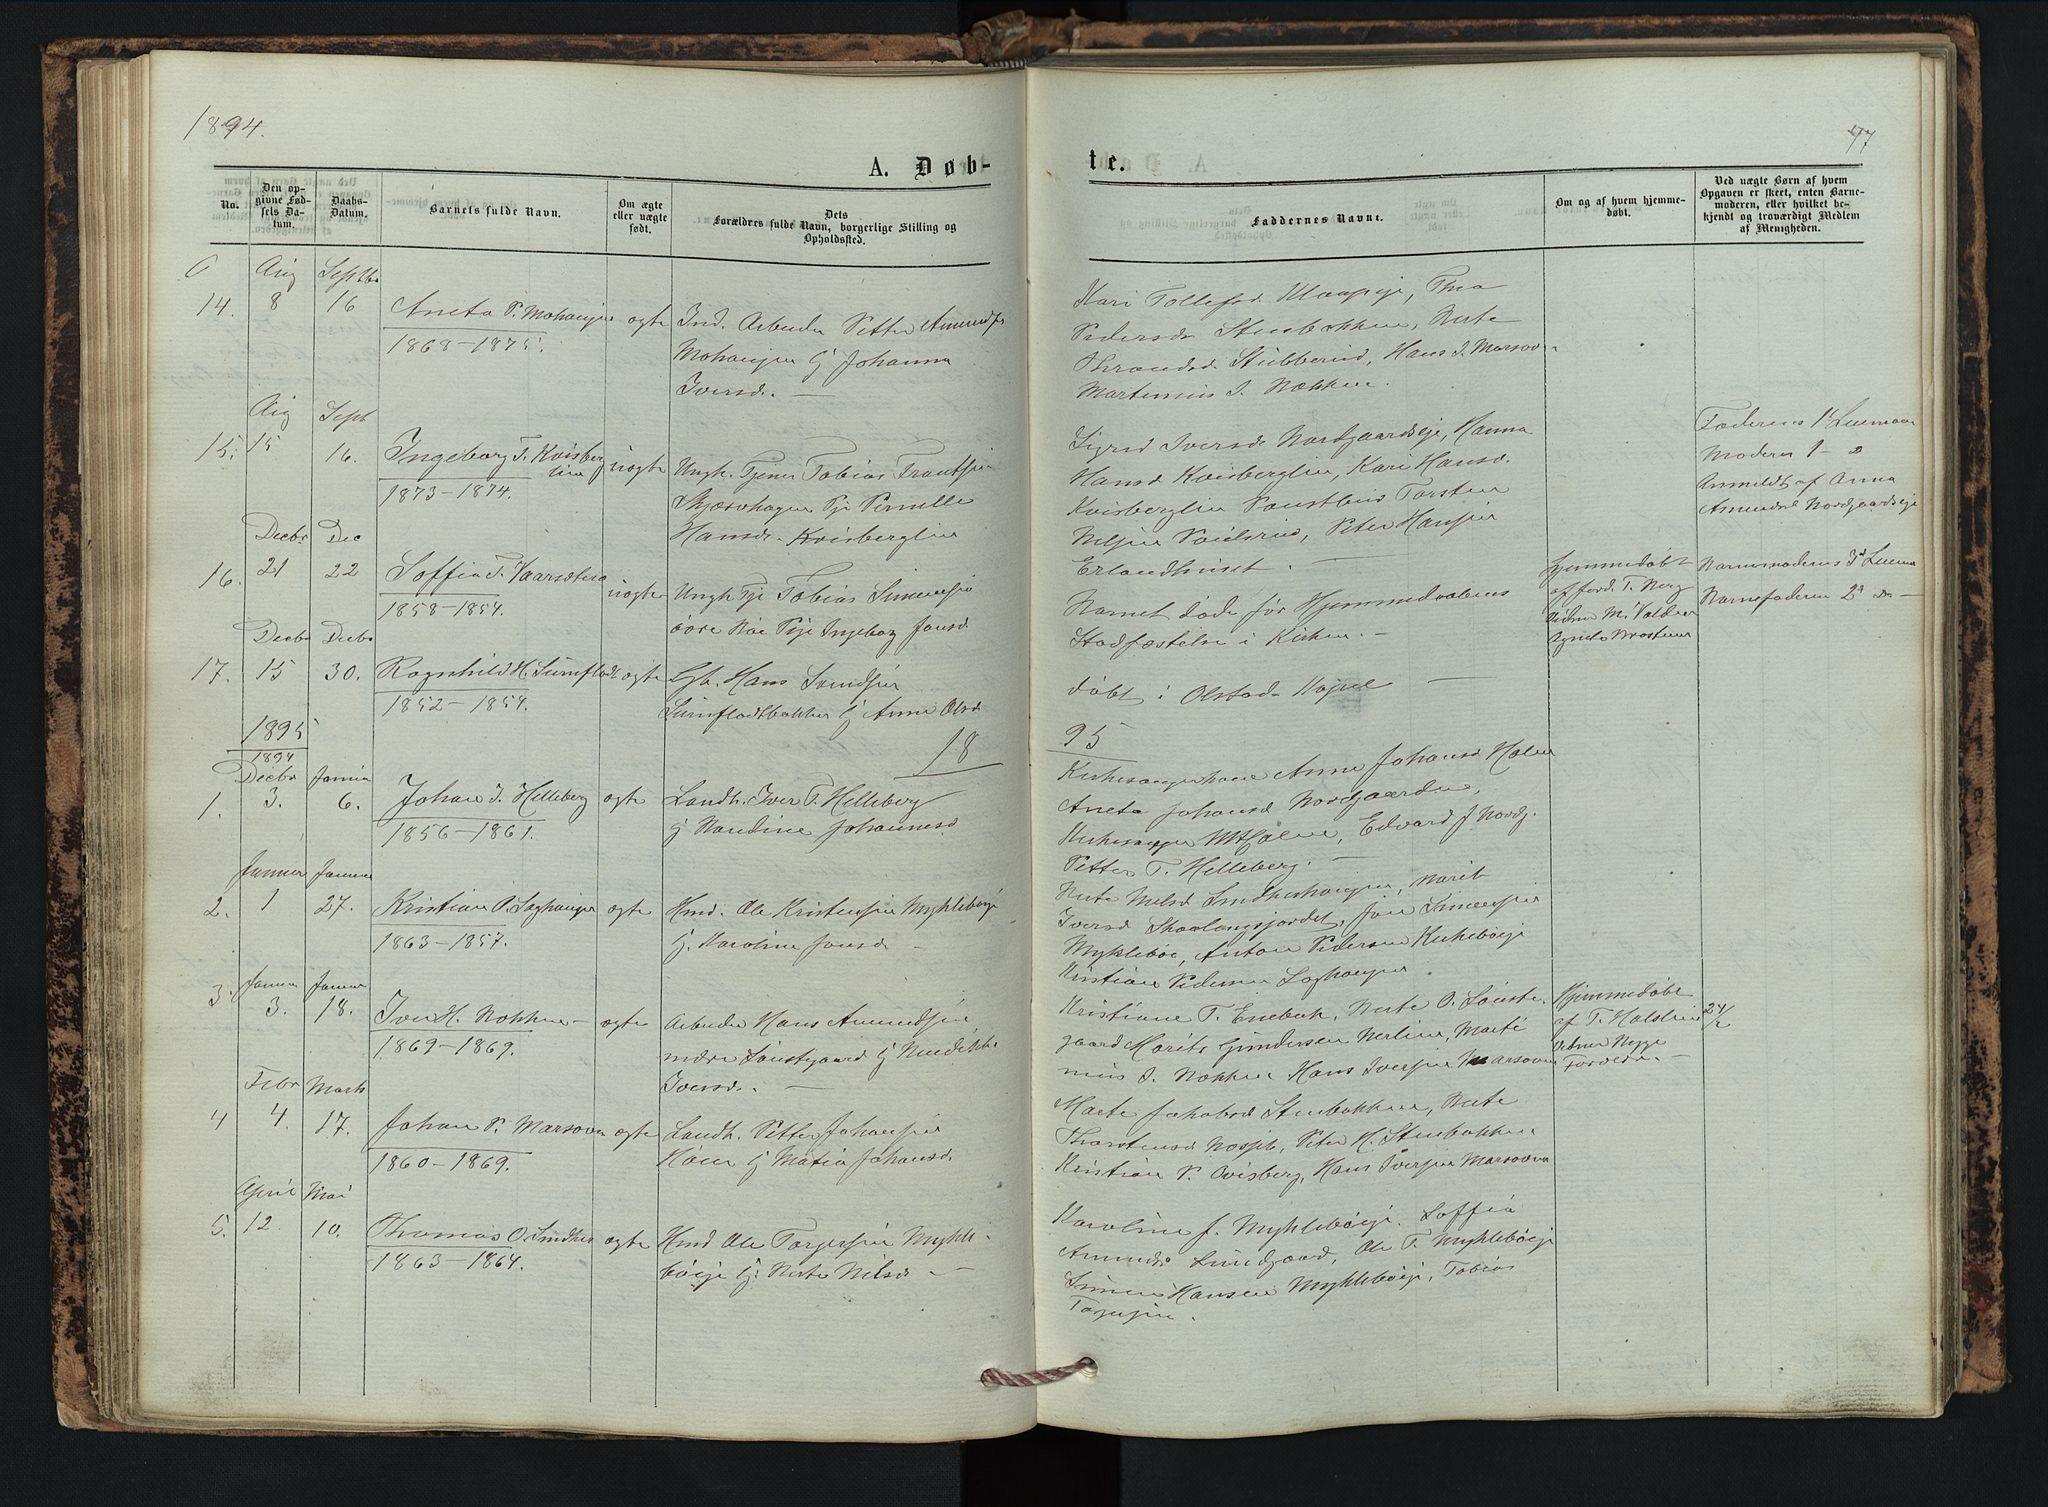 SAH, Vestre Gausdal prestekontor, Klokkerbok nr. 2, 1874-1897, s. 47